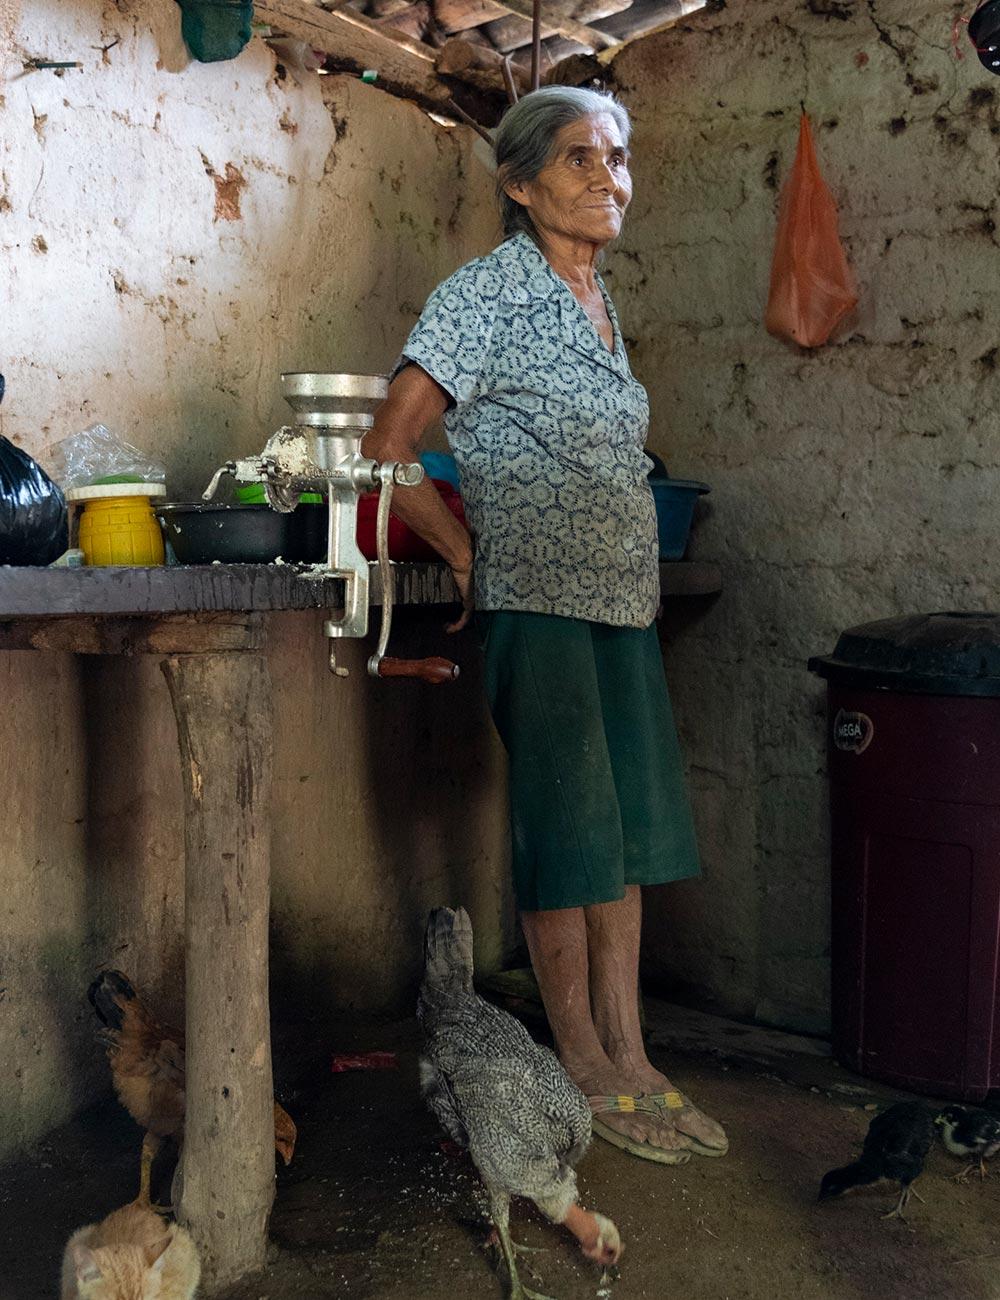 Worker Housing - Finca Santa Teresa, Nicaragua, 16 families completed, 20 families in progress